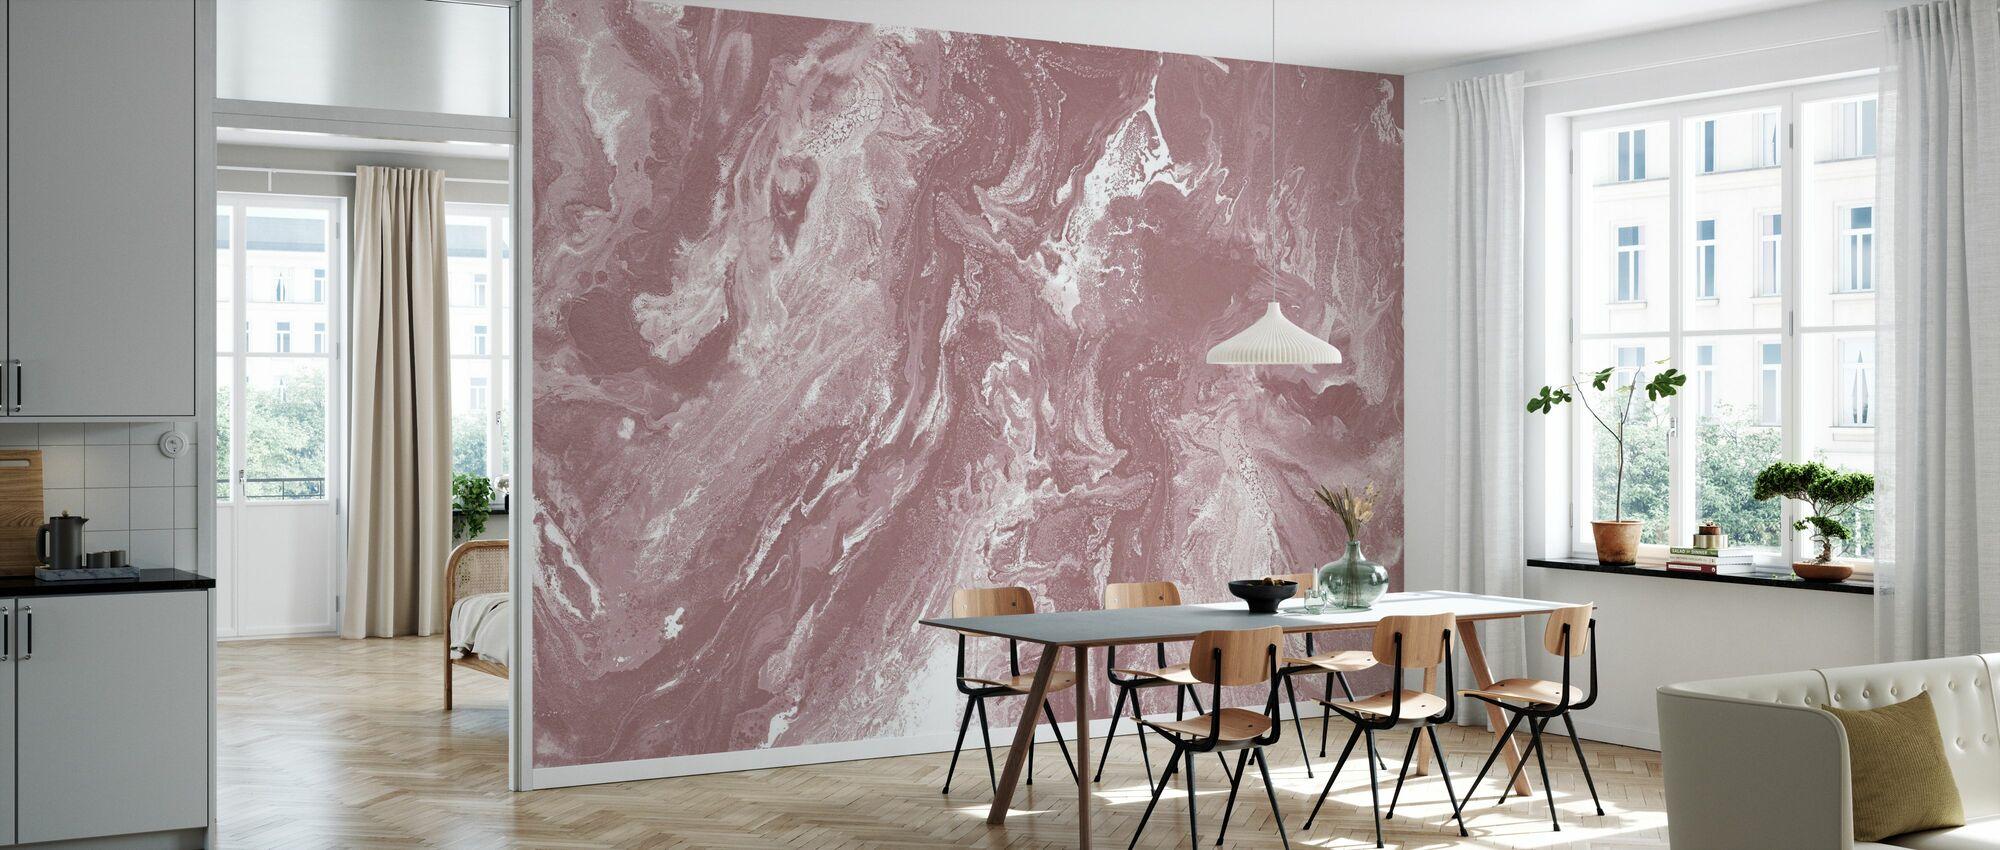 Brume - Old Blush - Wallpaper - Kitchen